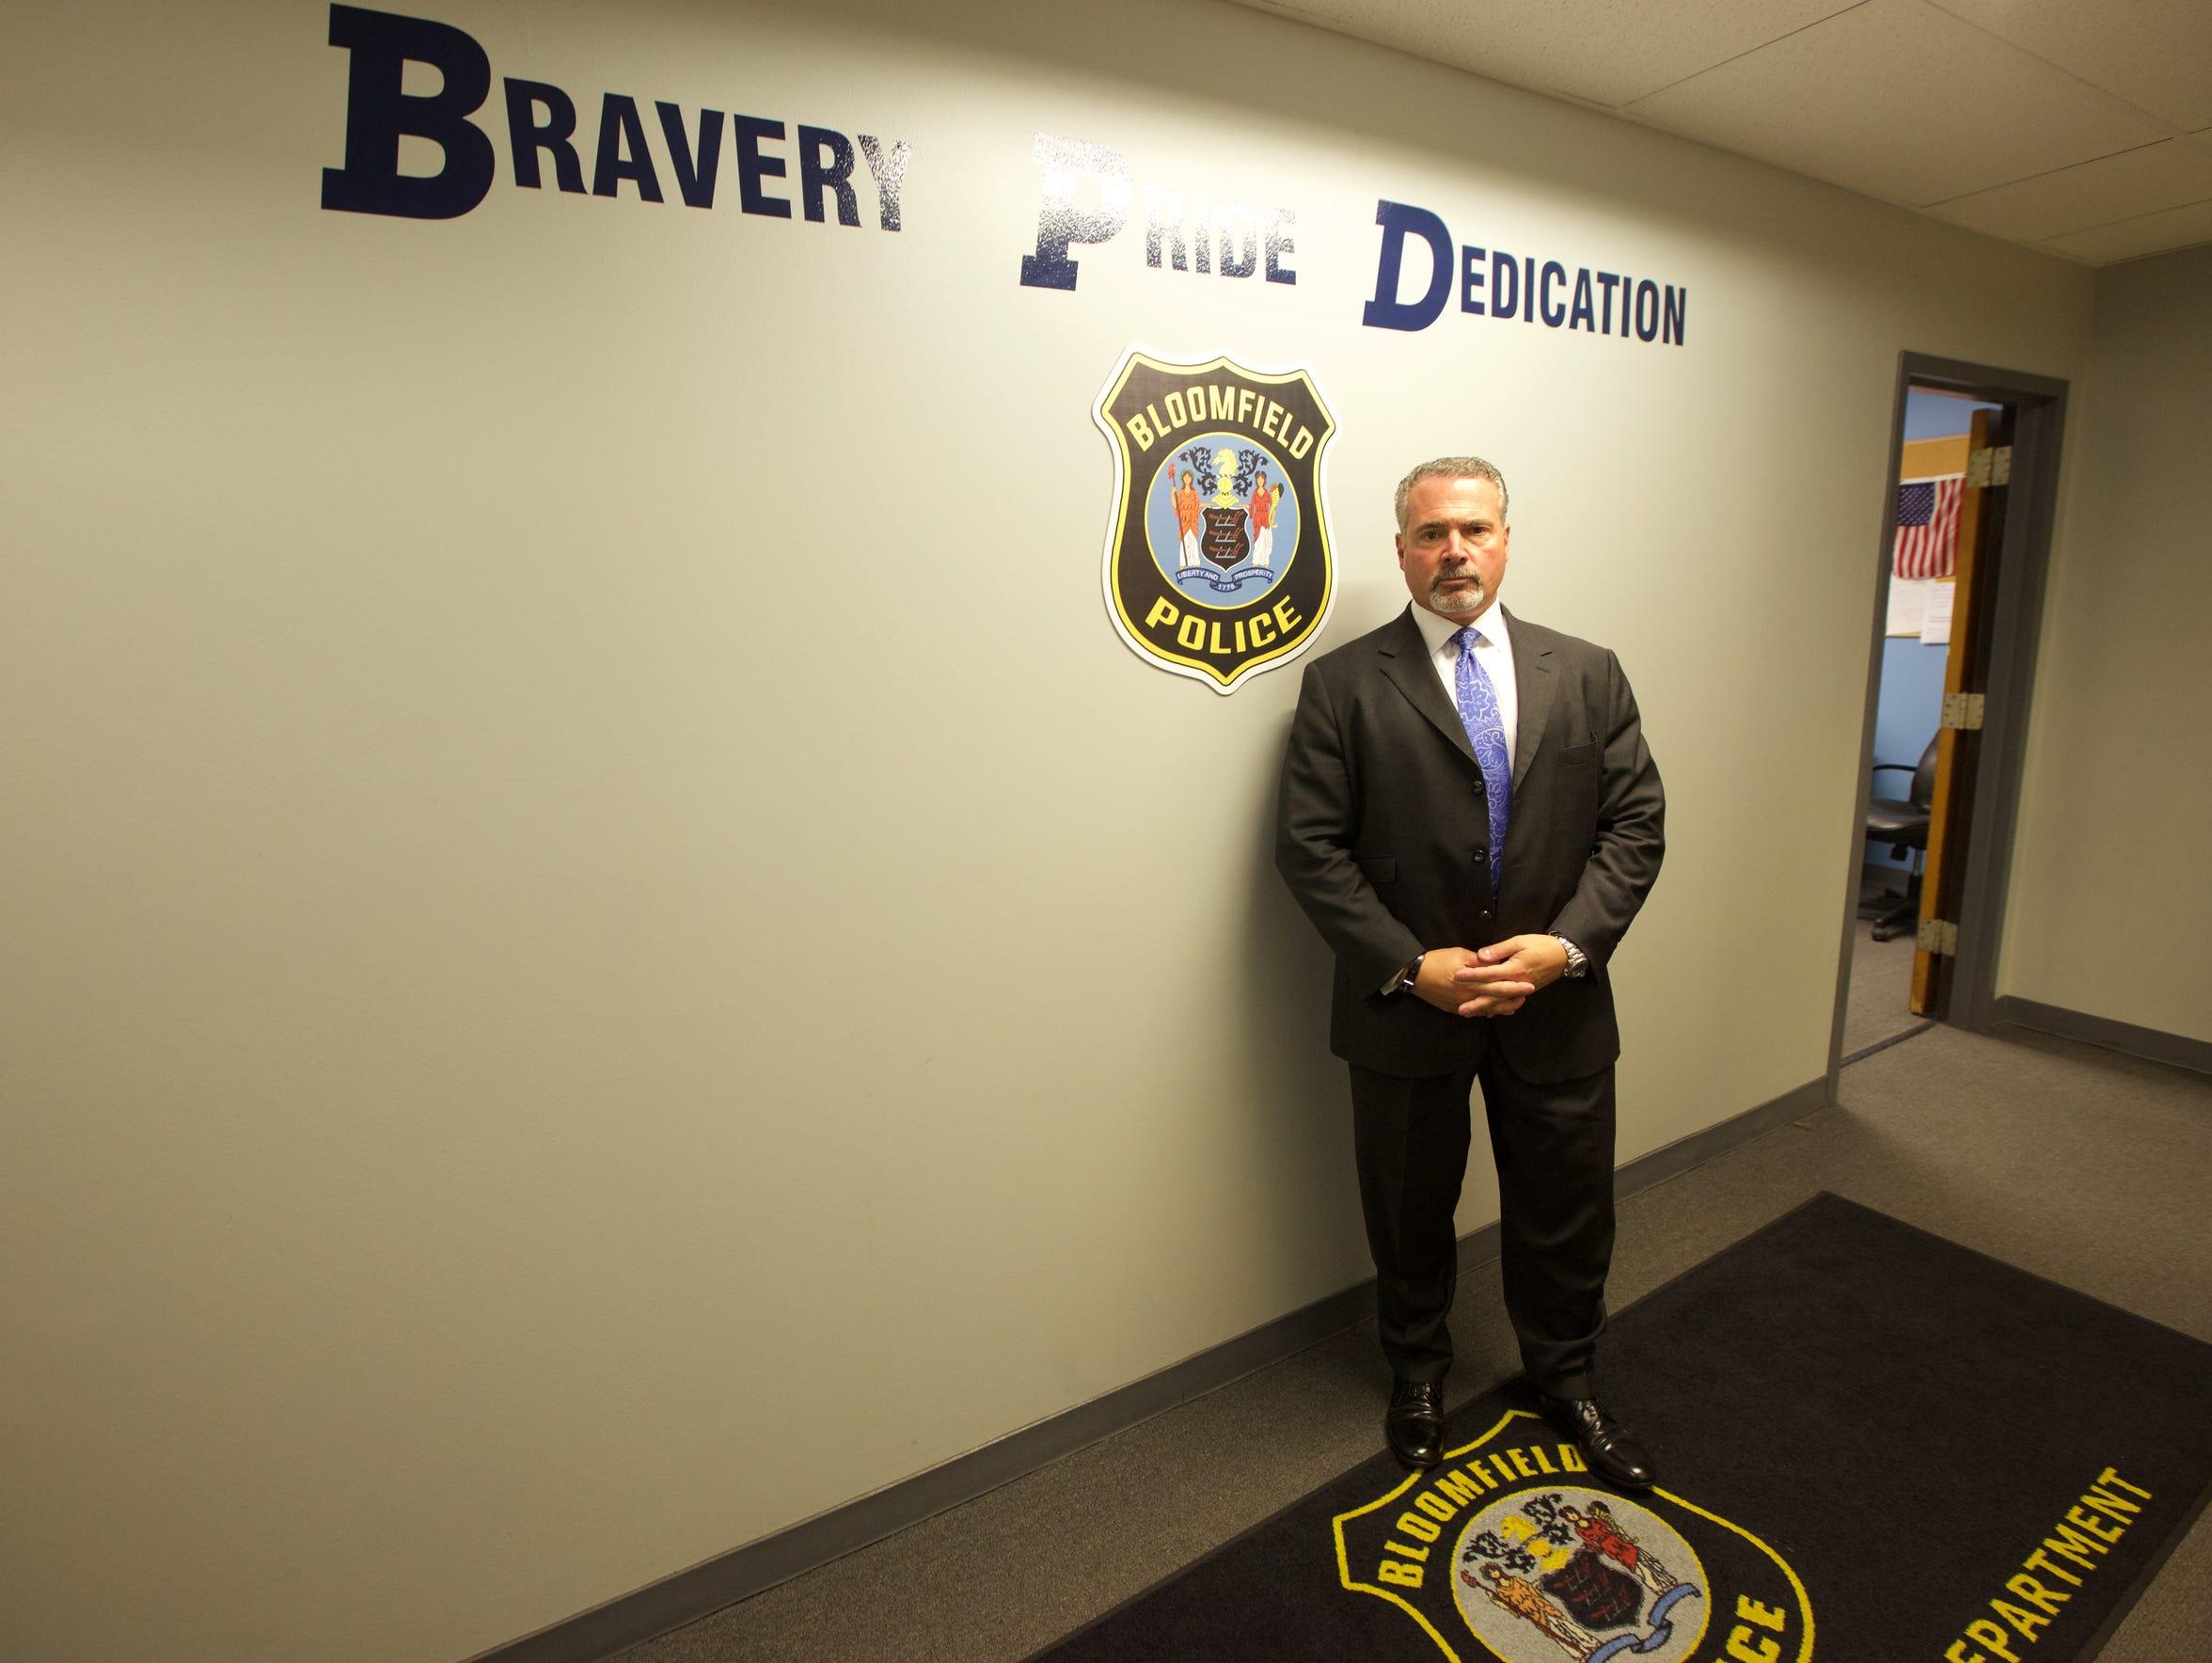 Bloomfield public safety director Samuel DeMaio